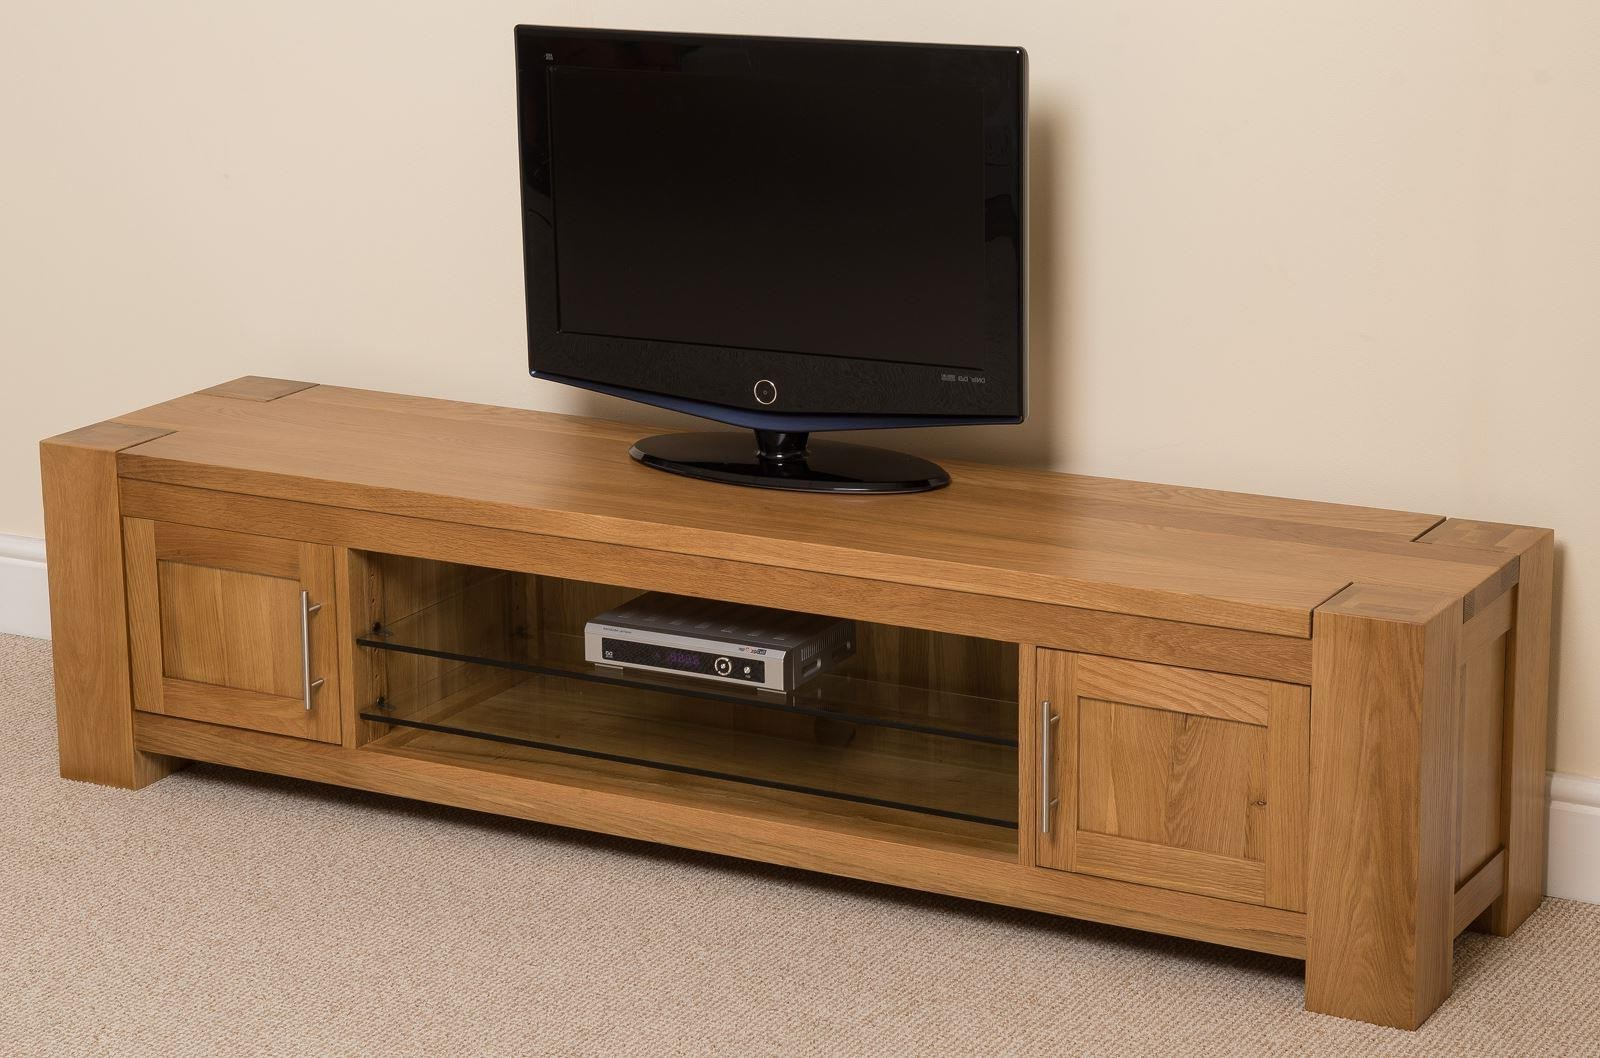 Oak Furniture King Within Oak Widescreen Tv Units (View 3 of 20)